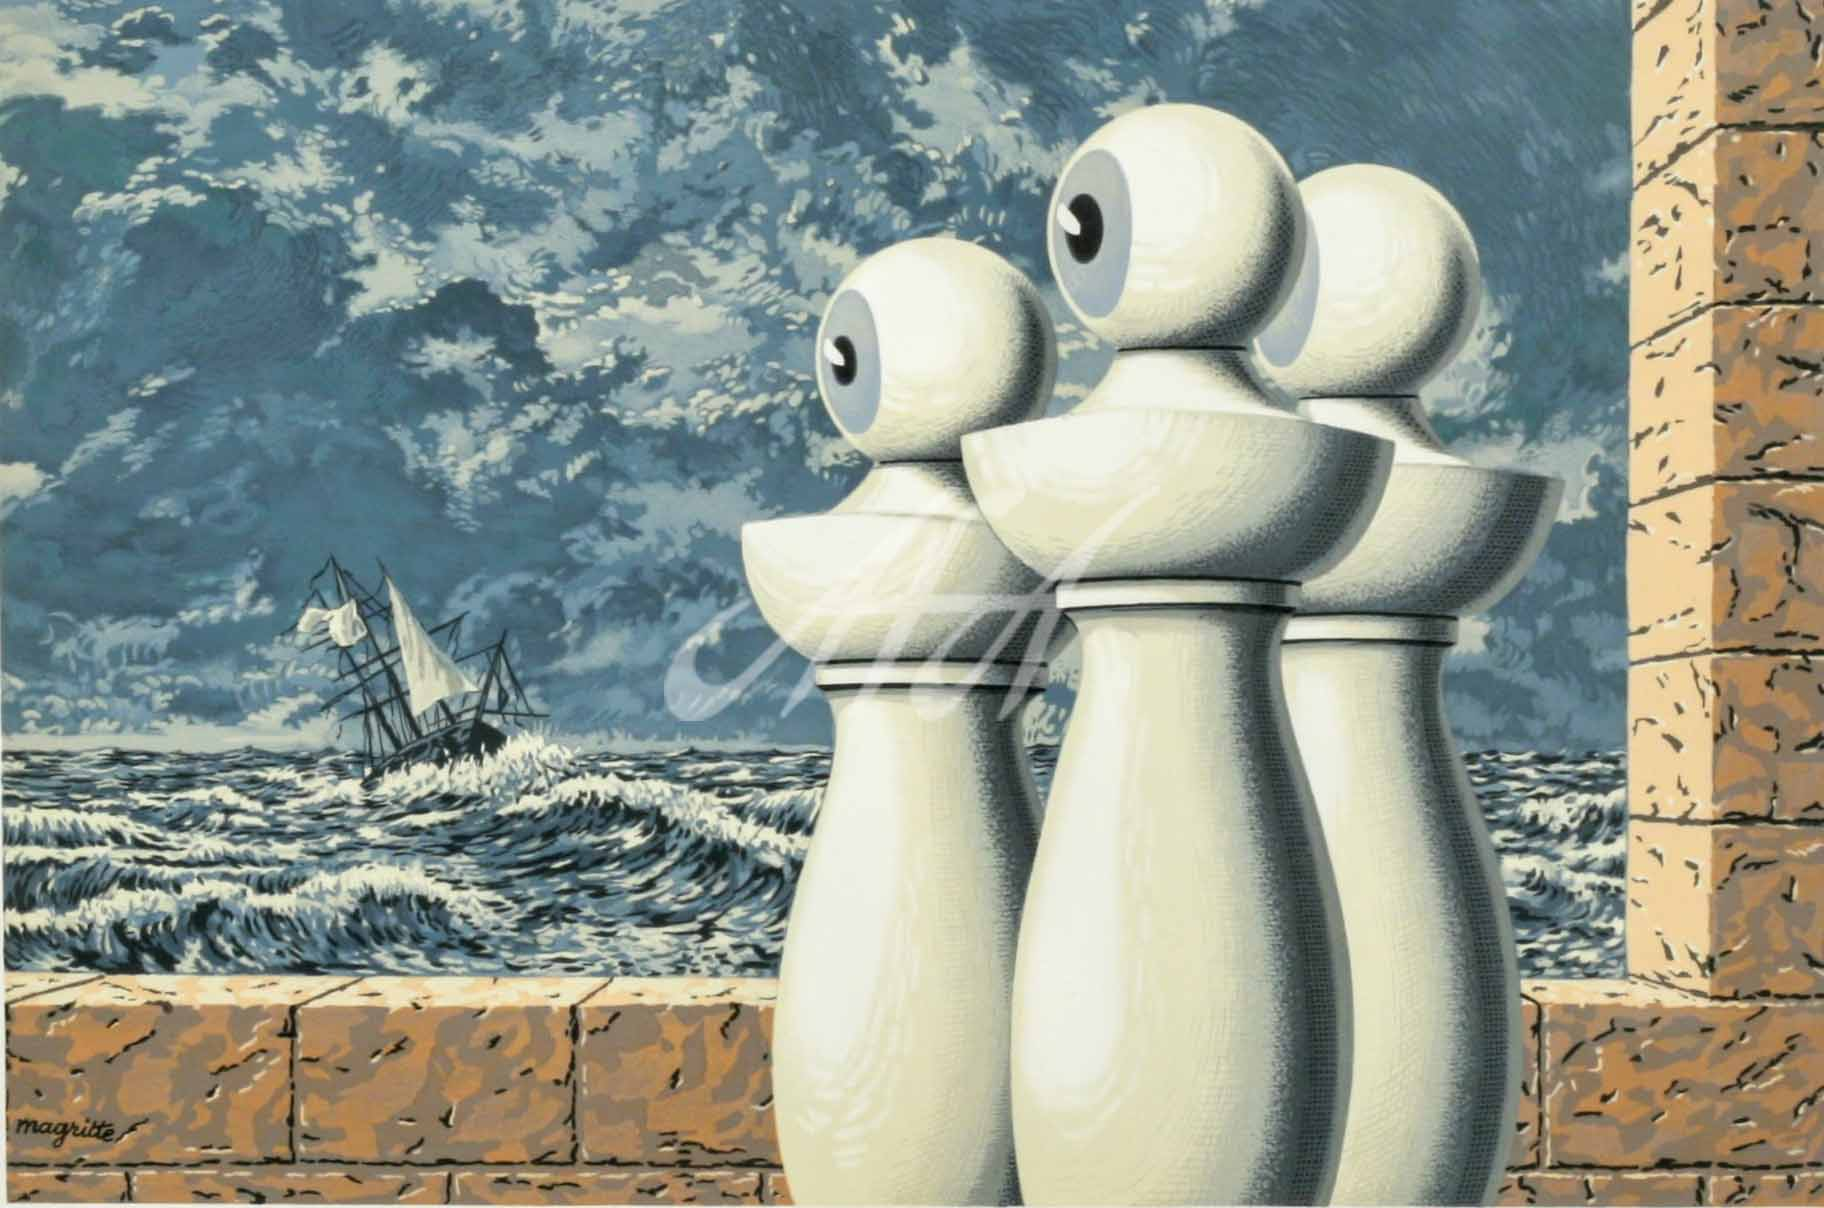 Magritte_ship with eyeballs watermark.jpg